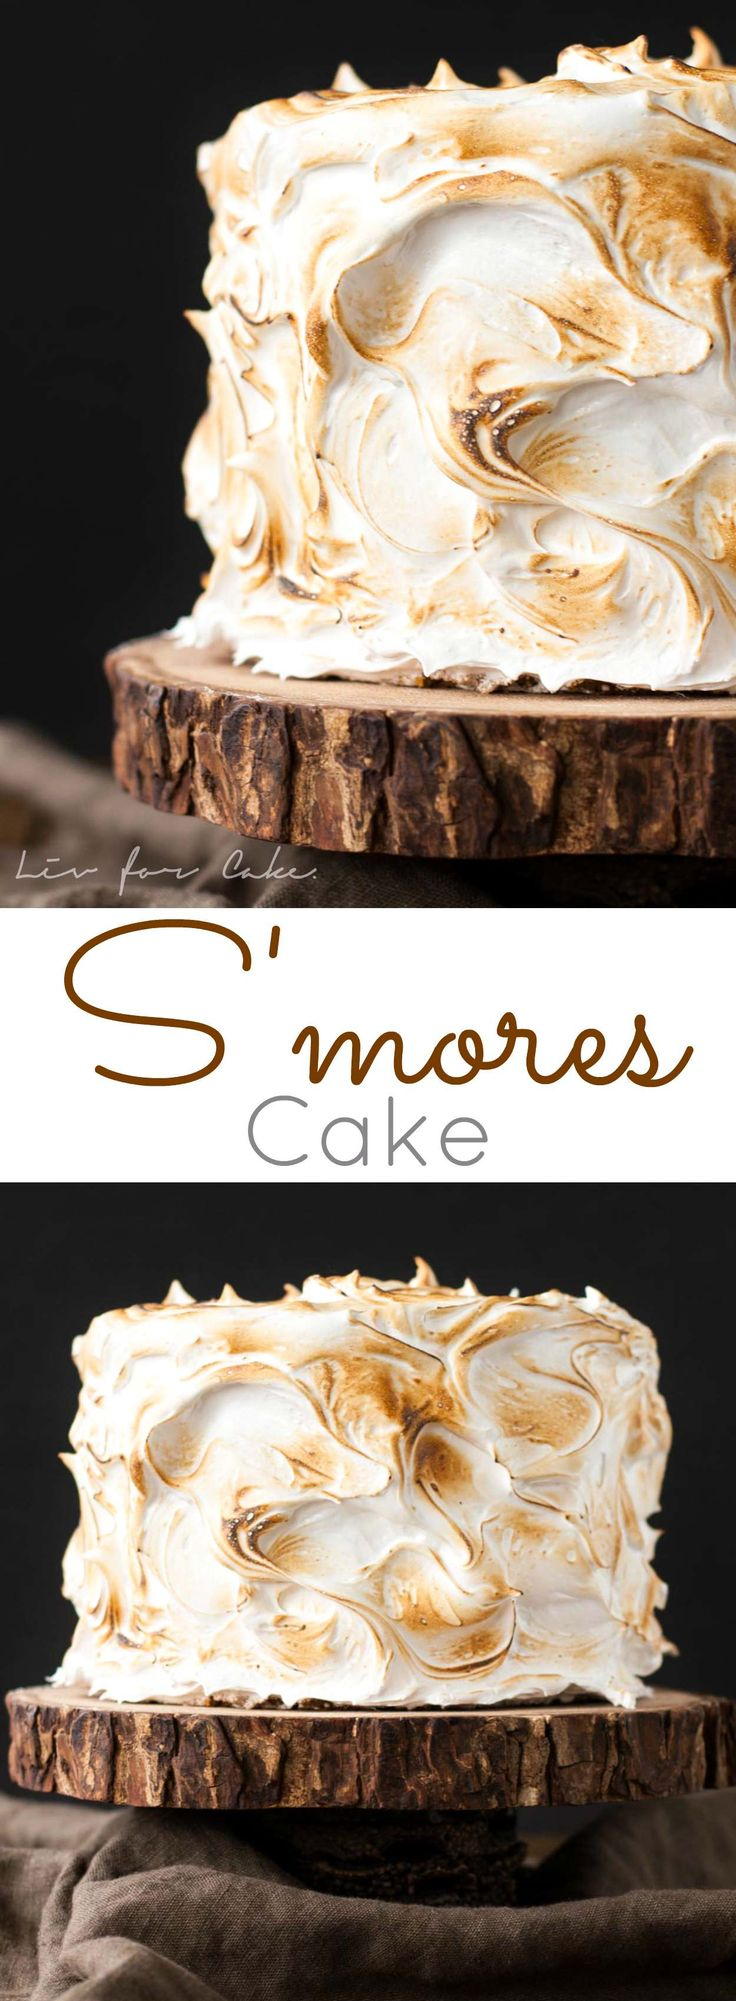 Marshmallow kuchen mit schokolade